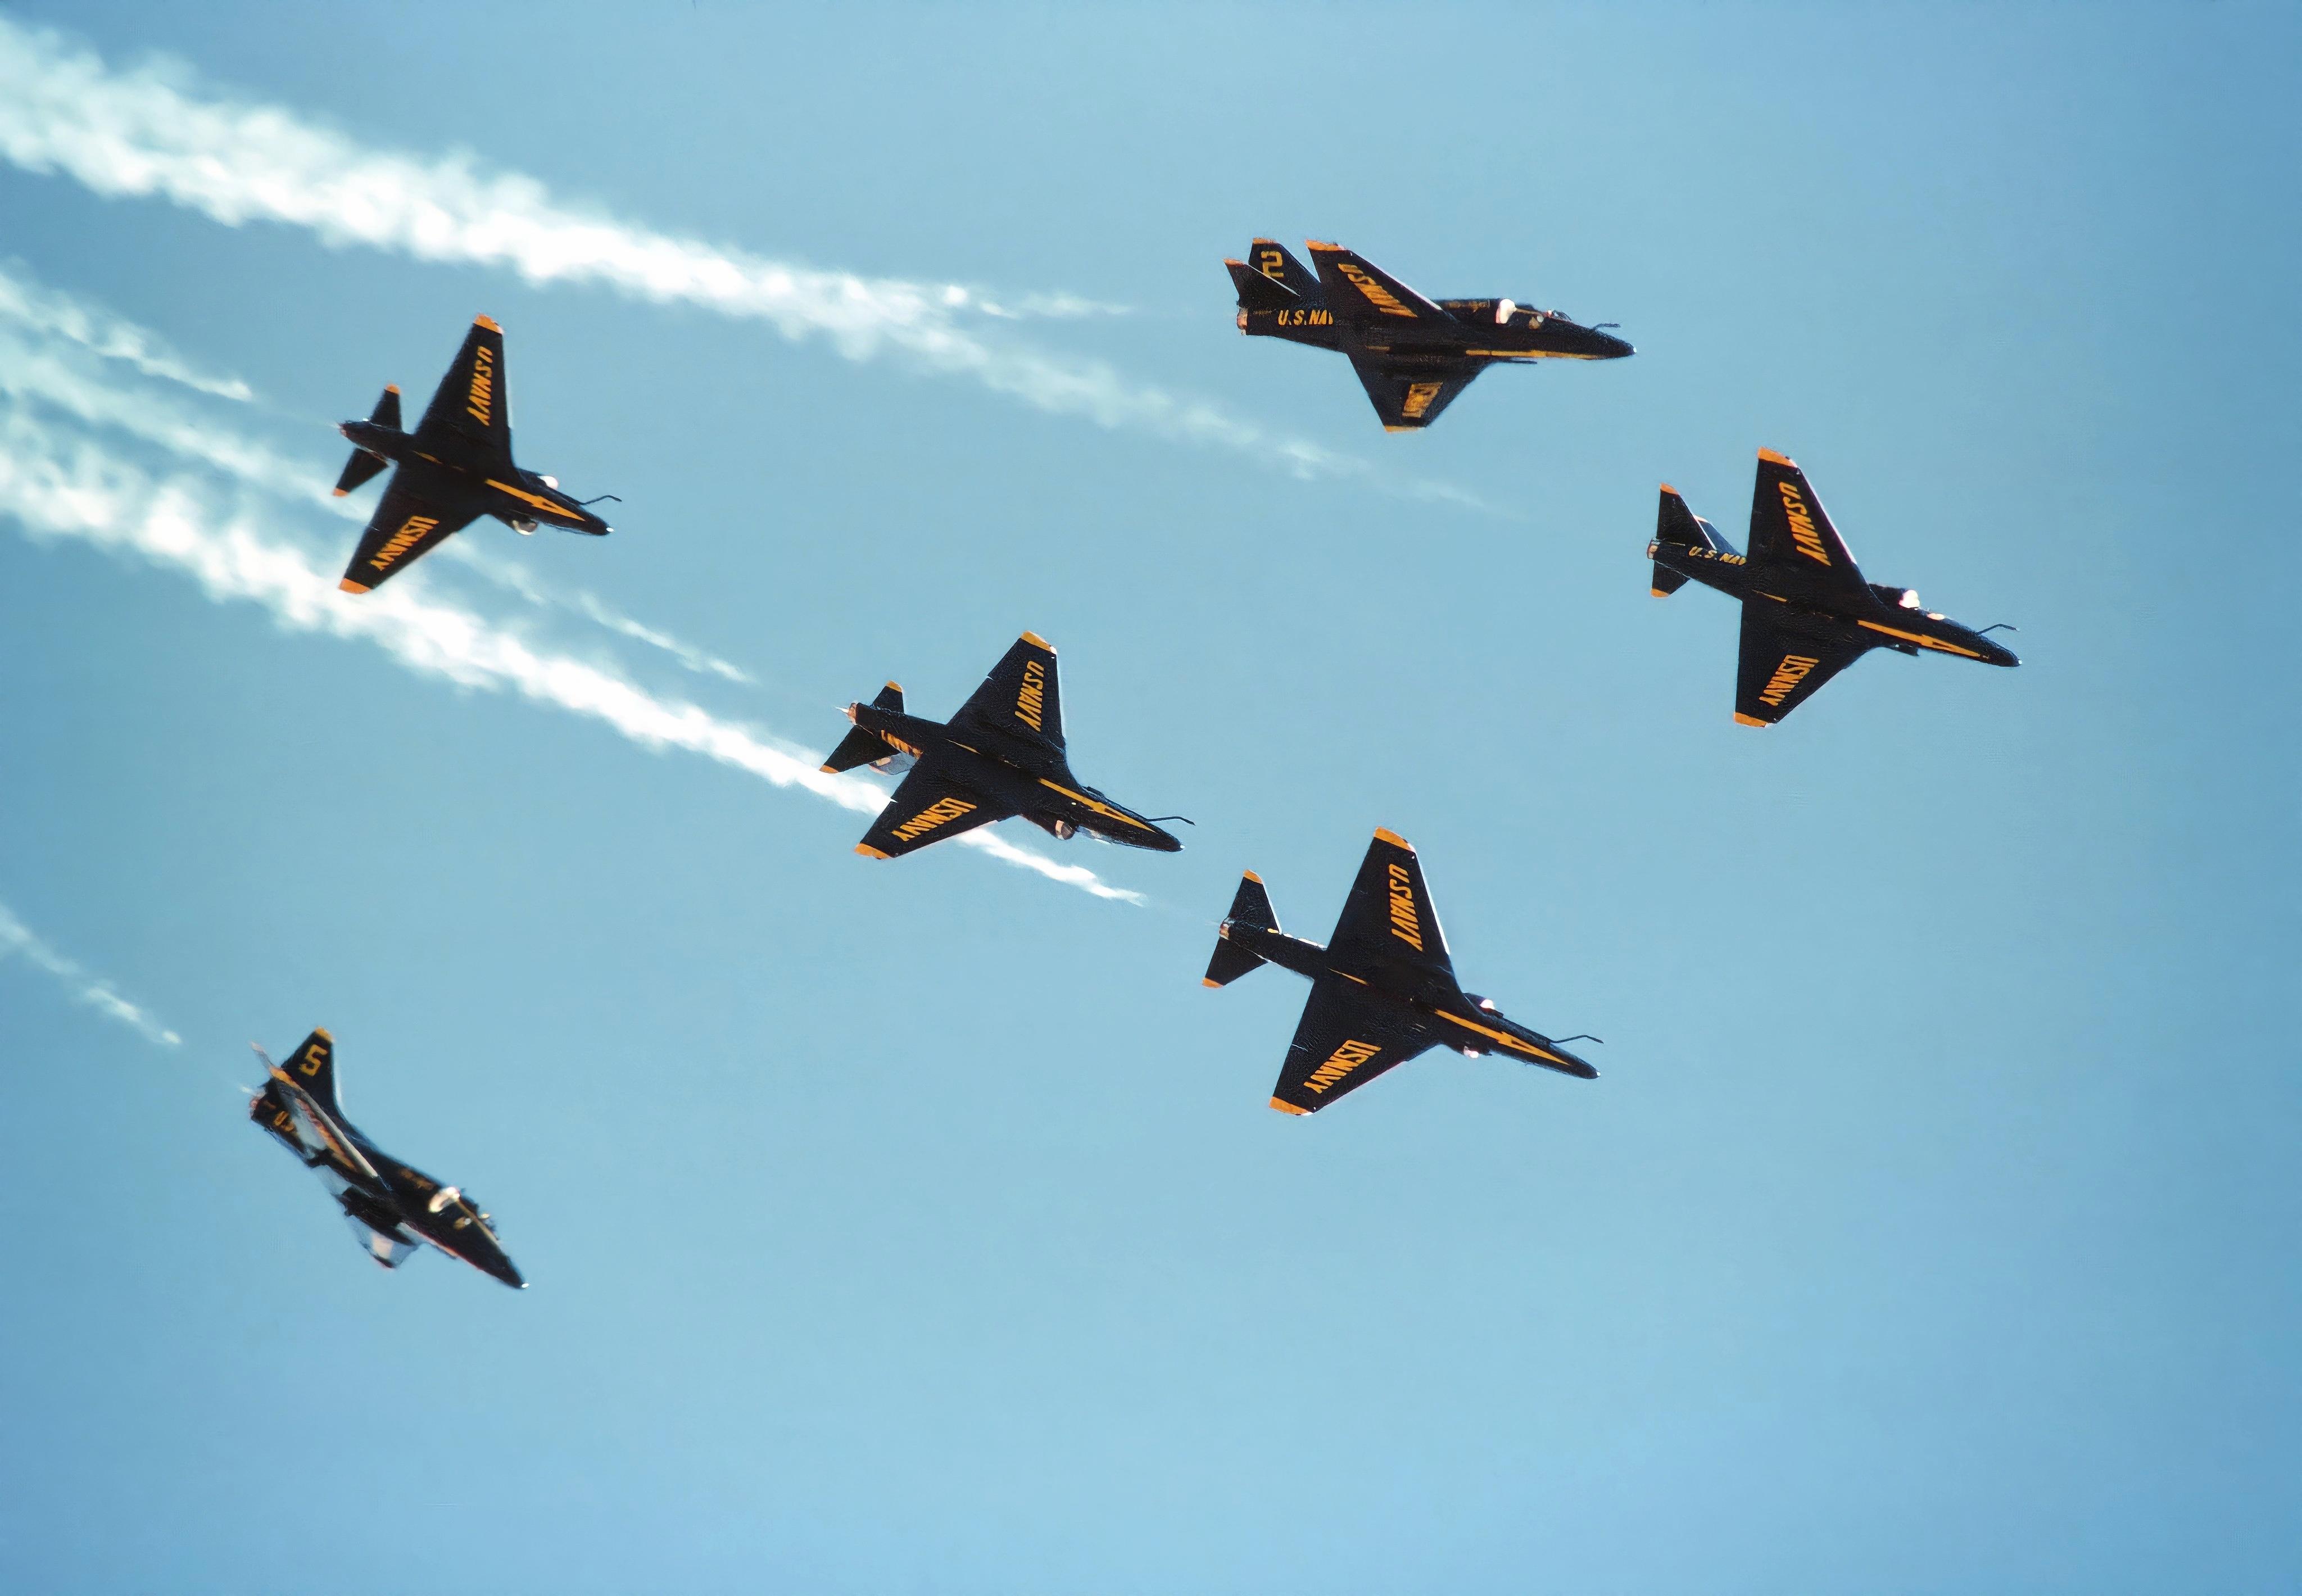 Consulta sobre video!! acrobacia con A-4! A-4Fs_Blue_Angels_Fleur_de_Lis_1984